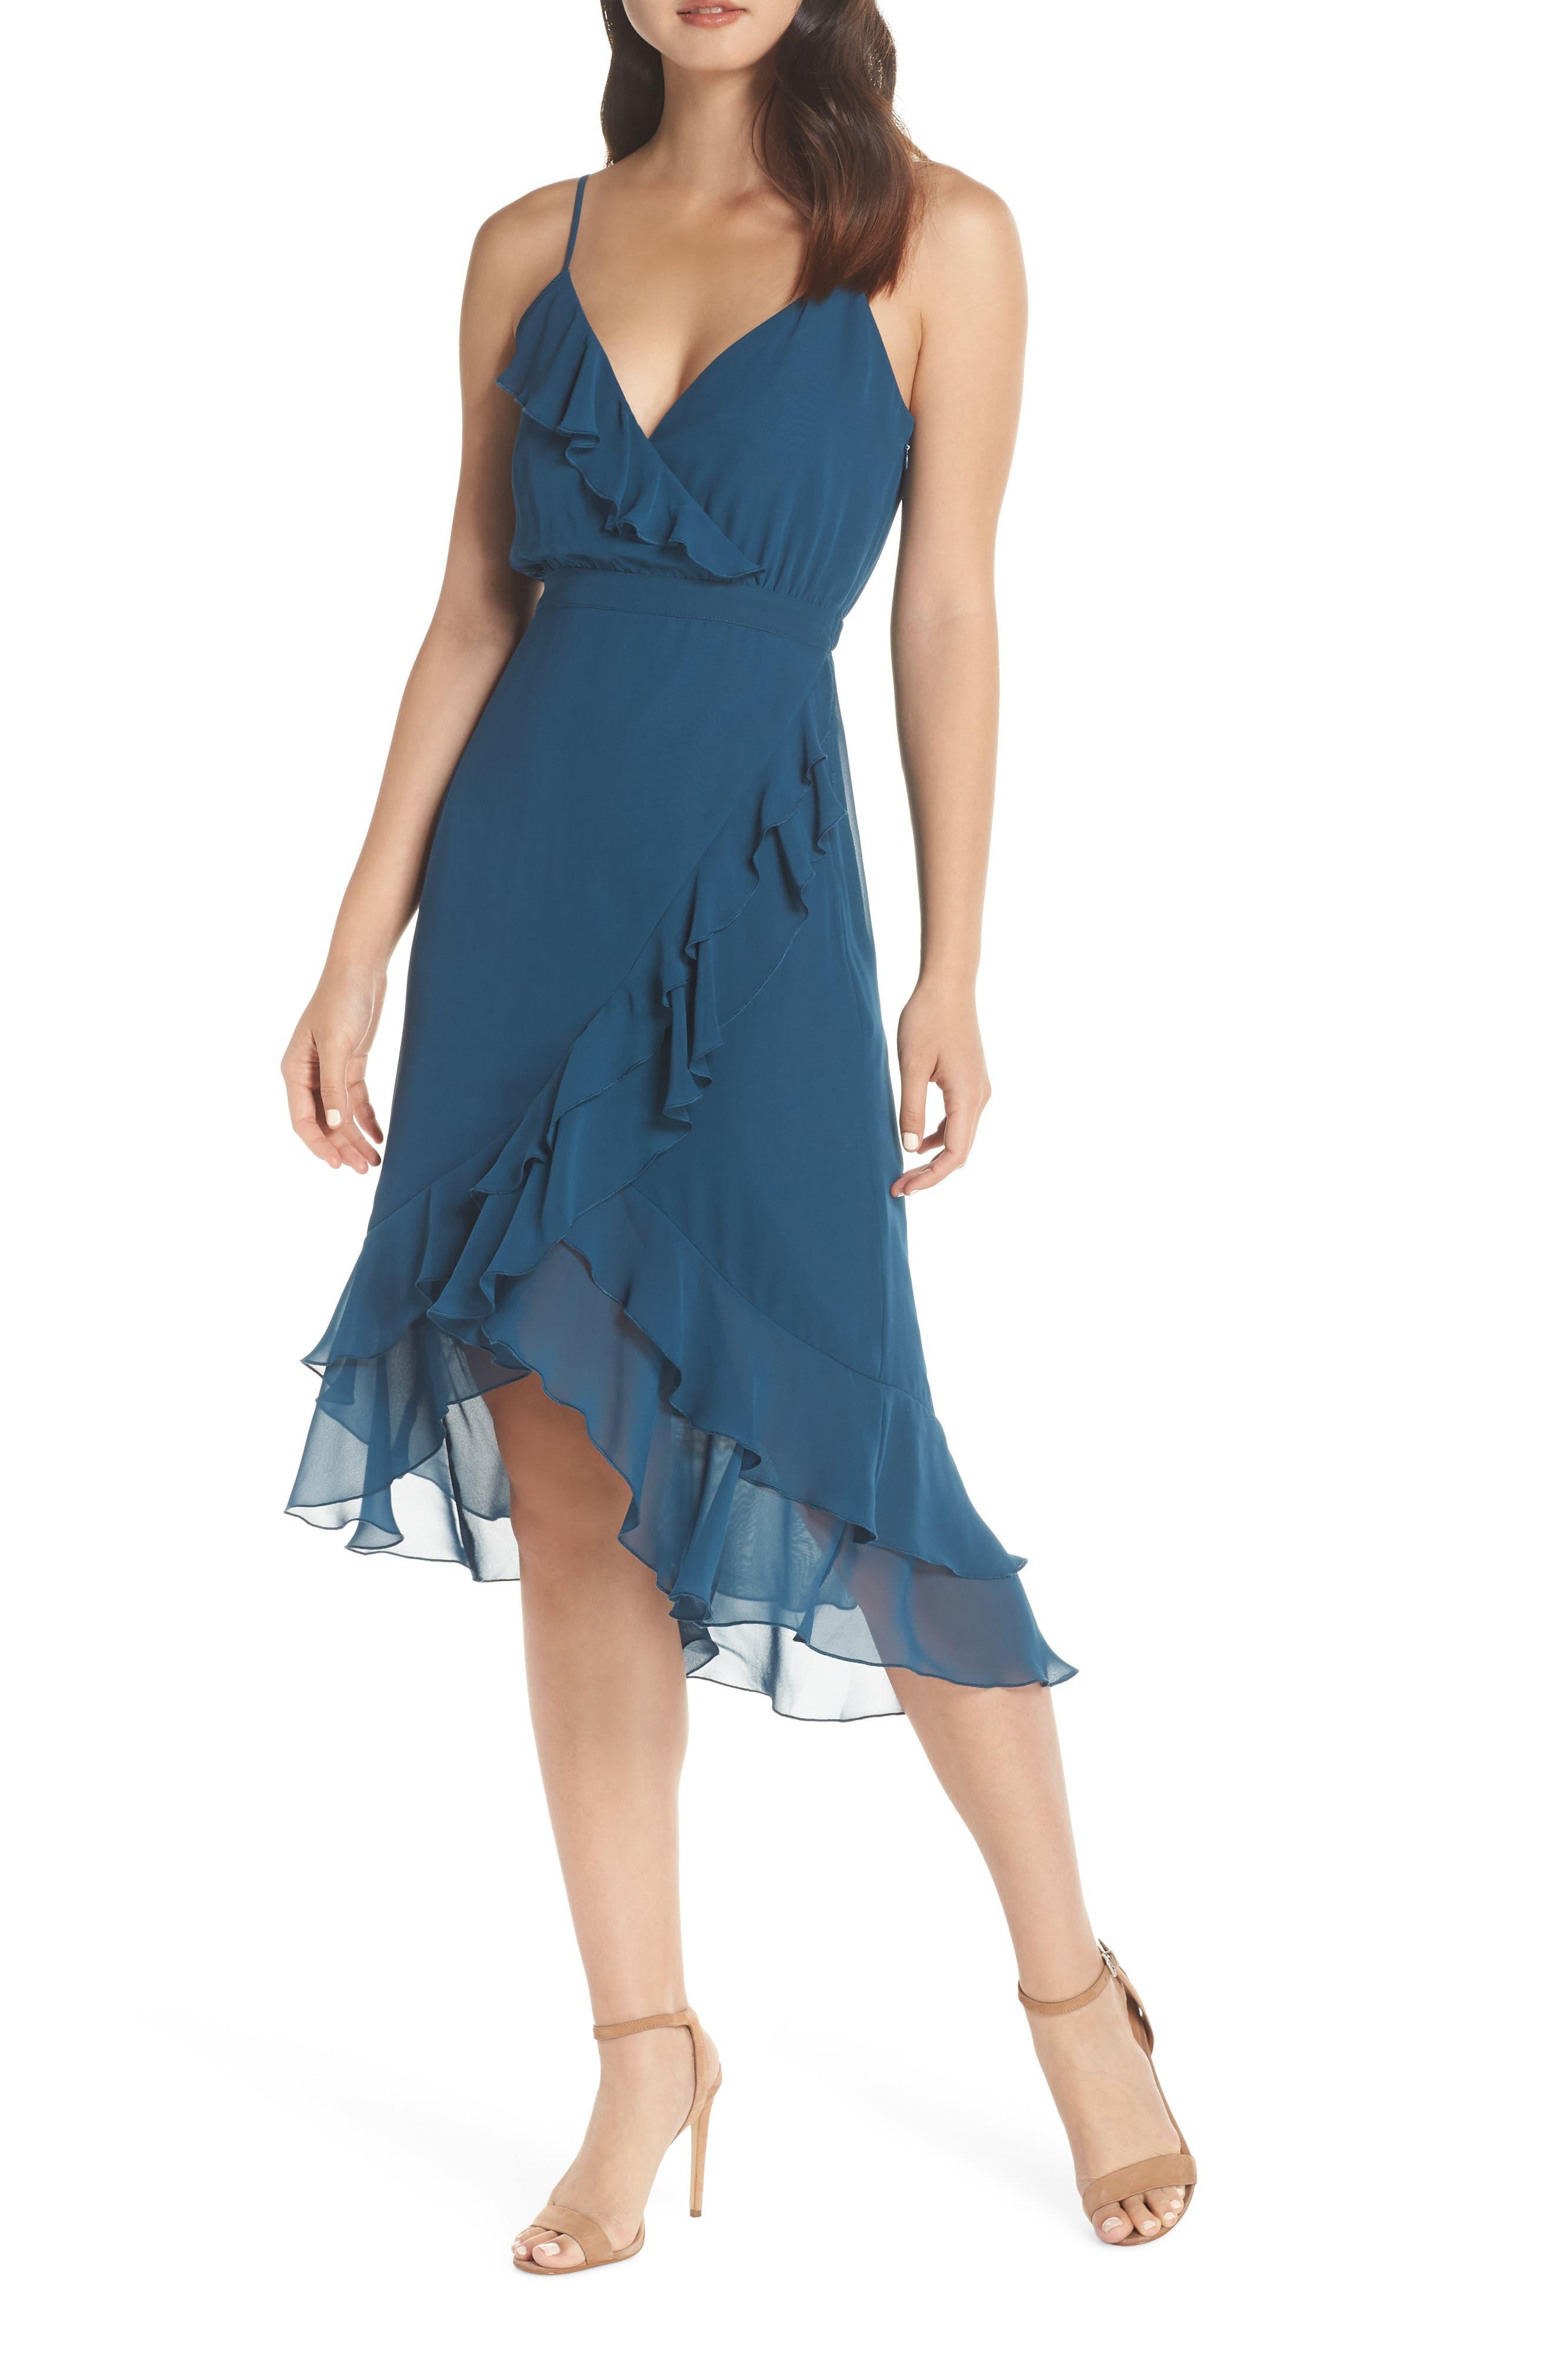 ALI & JAY, Pretty Lady High/Low Dress, Main thumbnail 1, color, 400